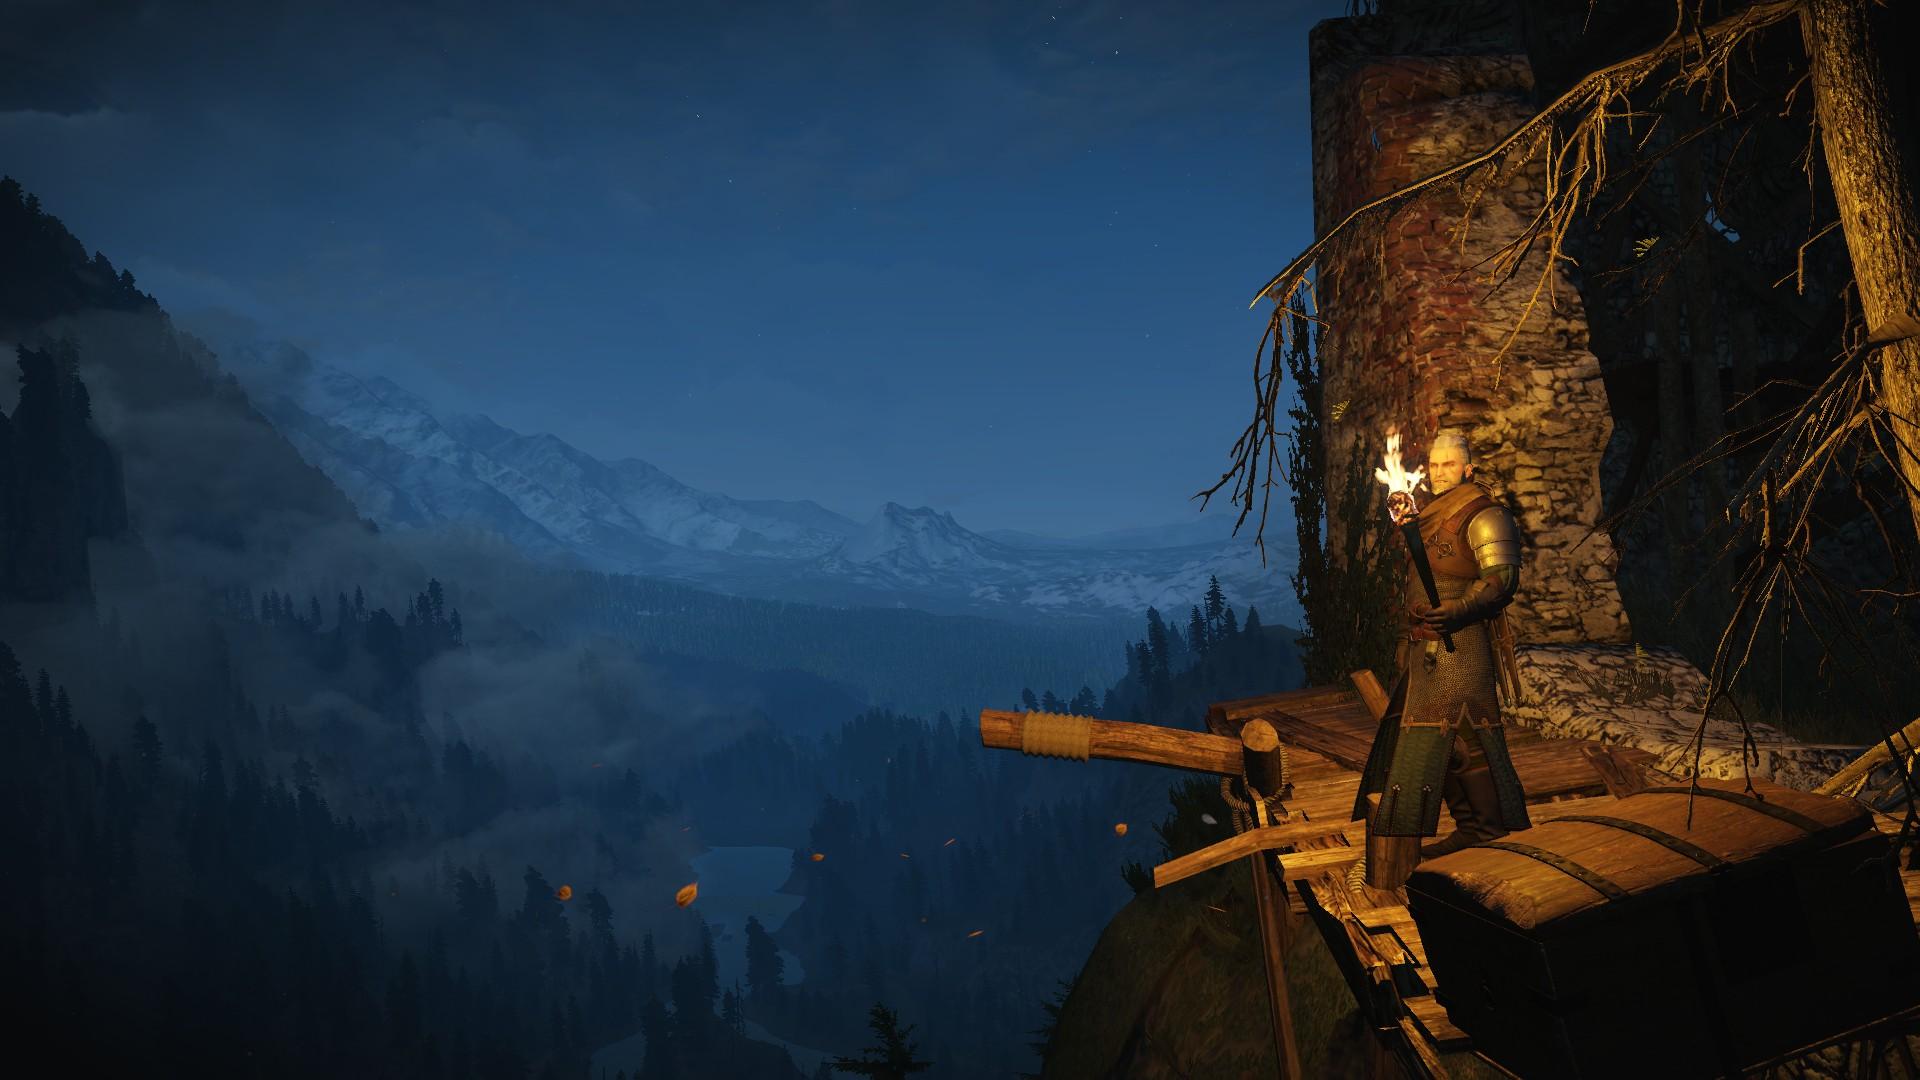 The Witcher 3 Screenshot 2019.02.09 - 23.41.10.45.jpg - Witcher 3: Wild Hunt, the